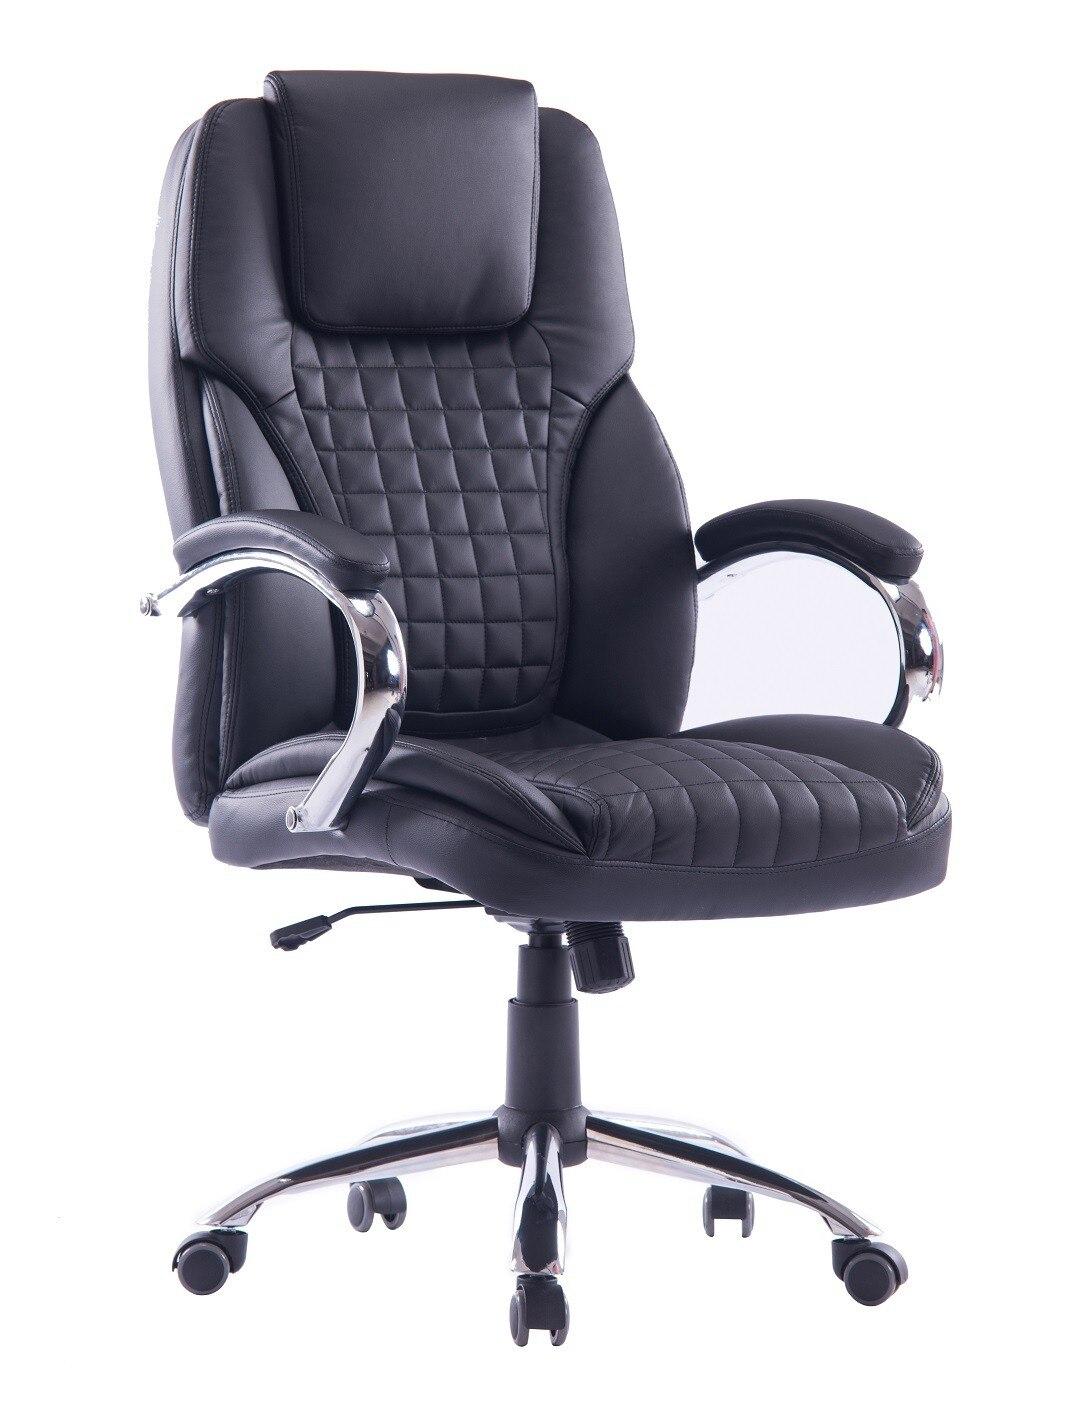 Office Armchair HAMBURG, High, Gas, Tilt, Similpiel Black